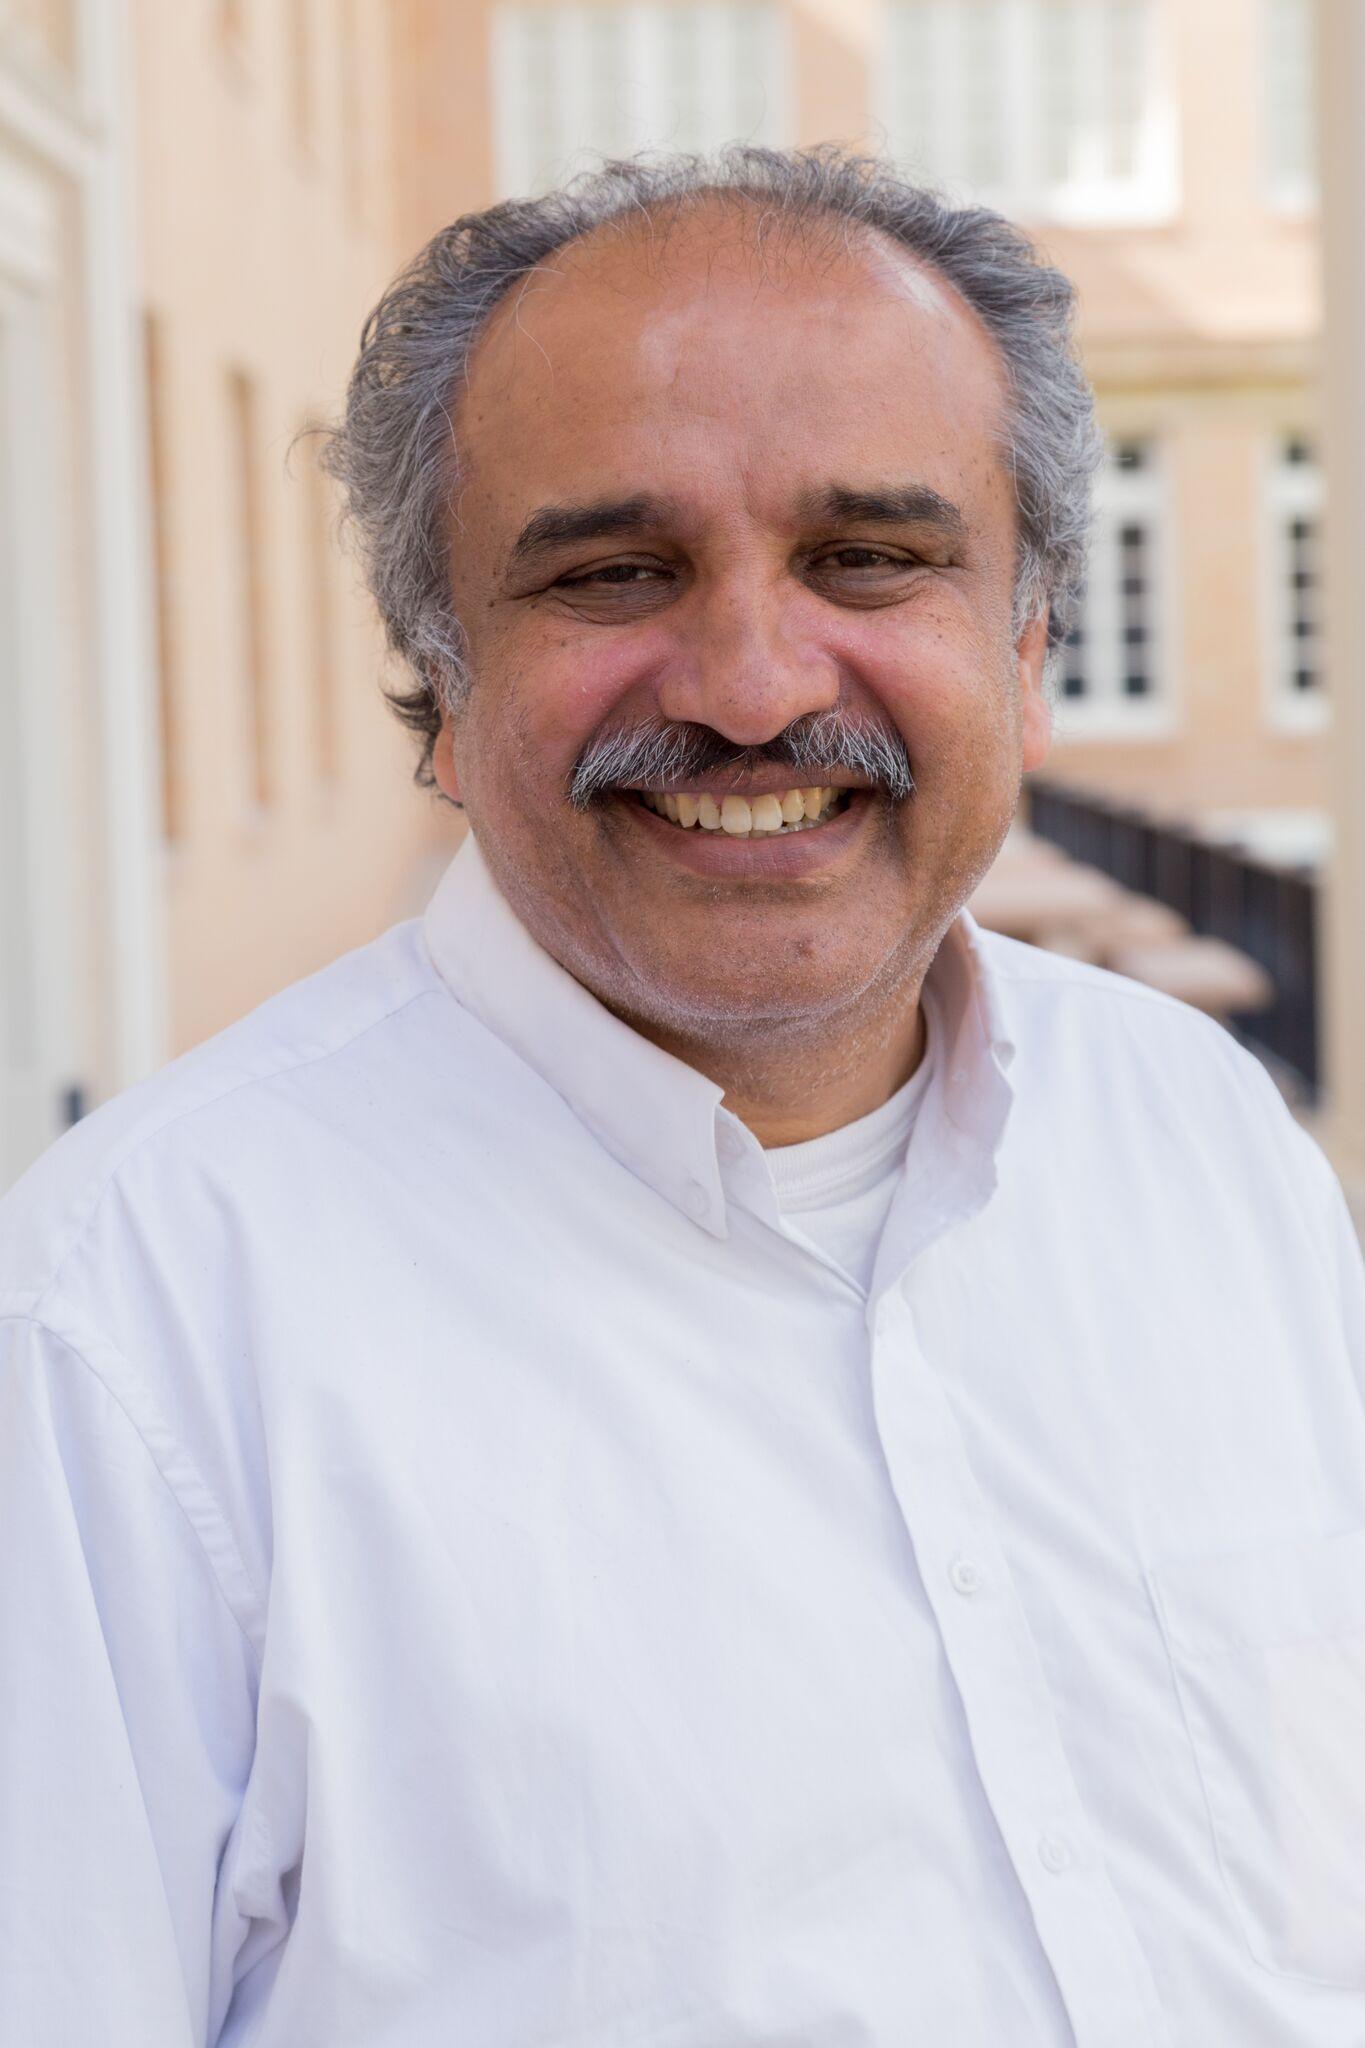 Kamran Asdar